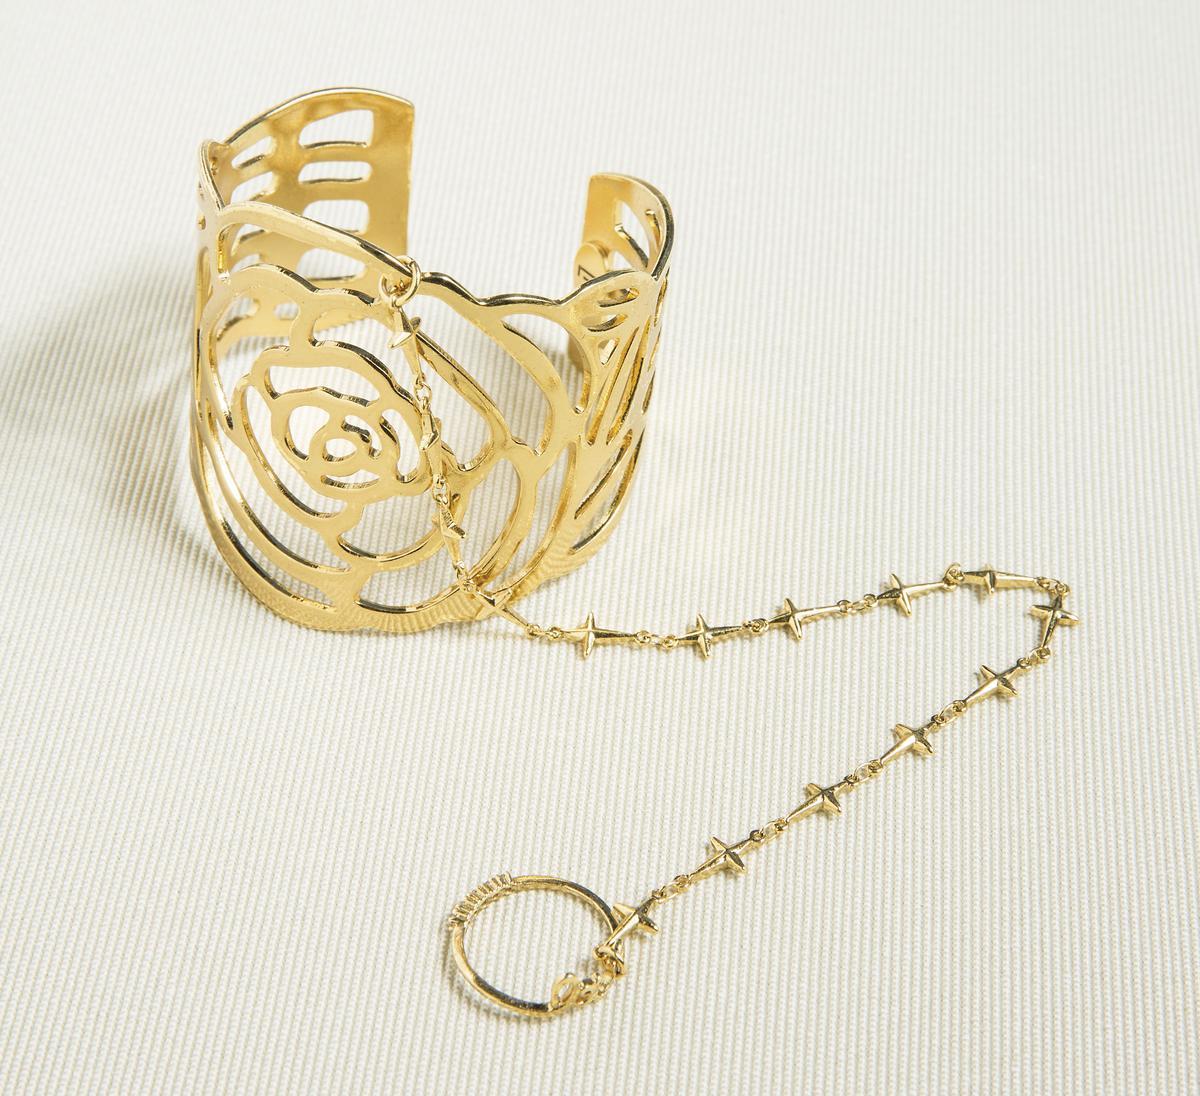 ecllective玫瑰花造型手環。廠商贈送